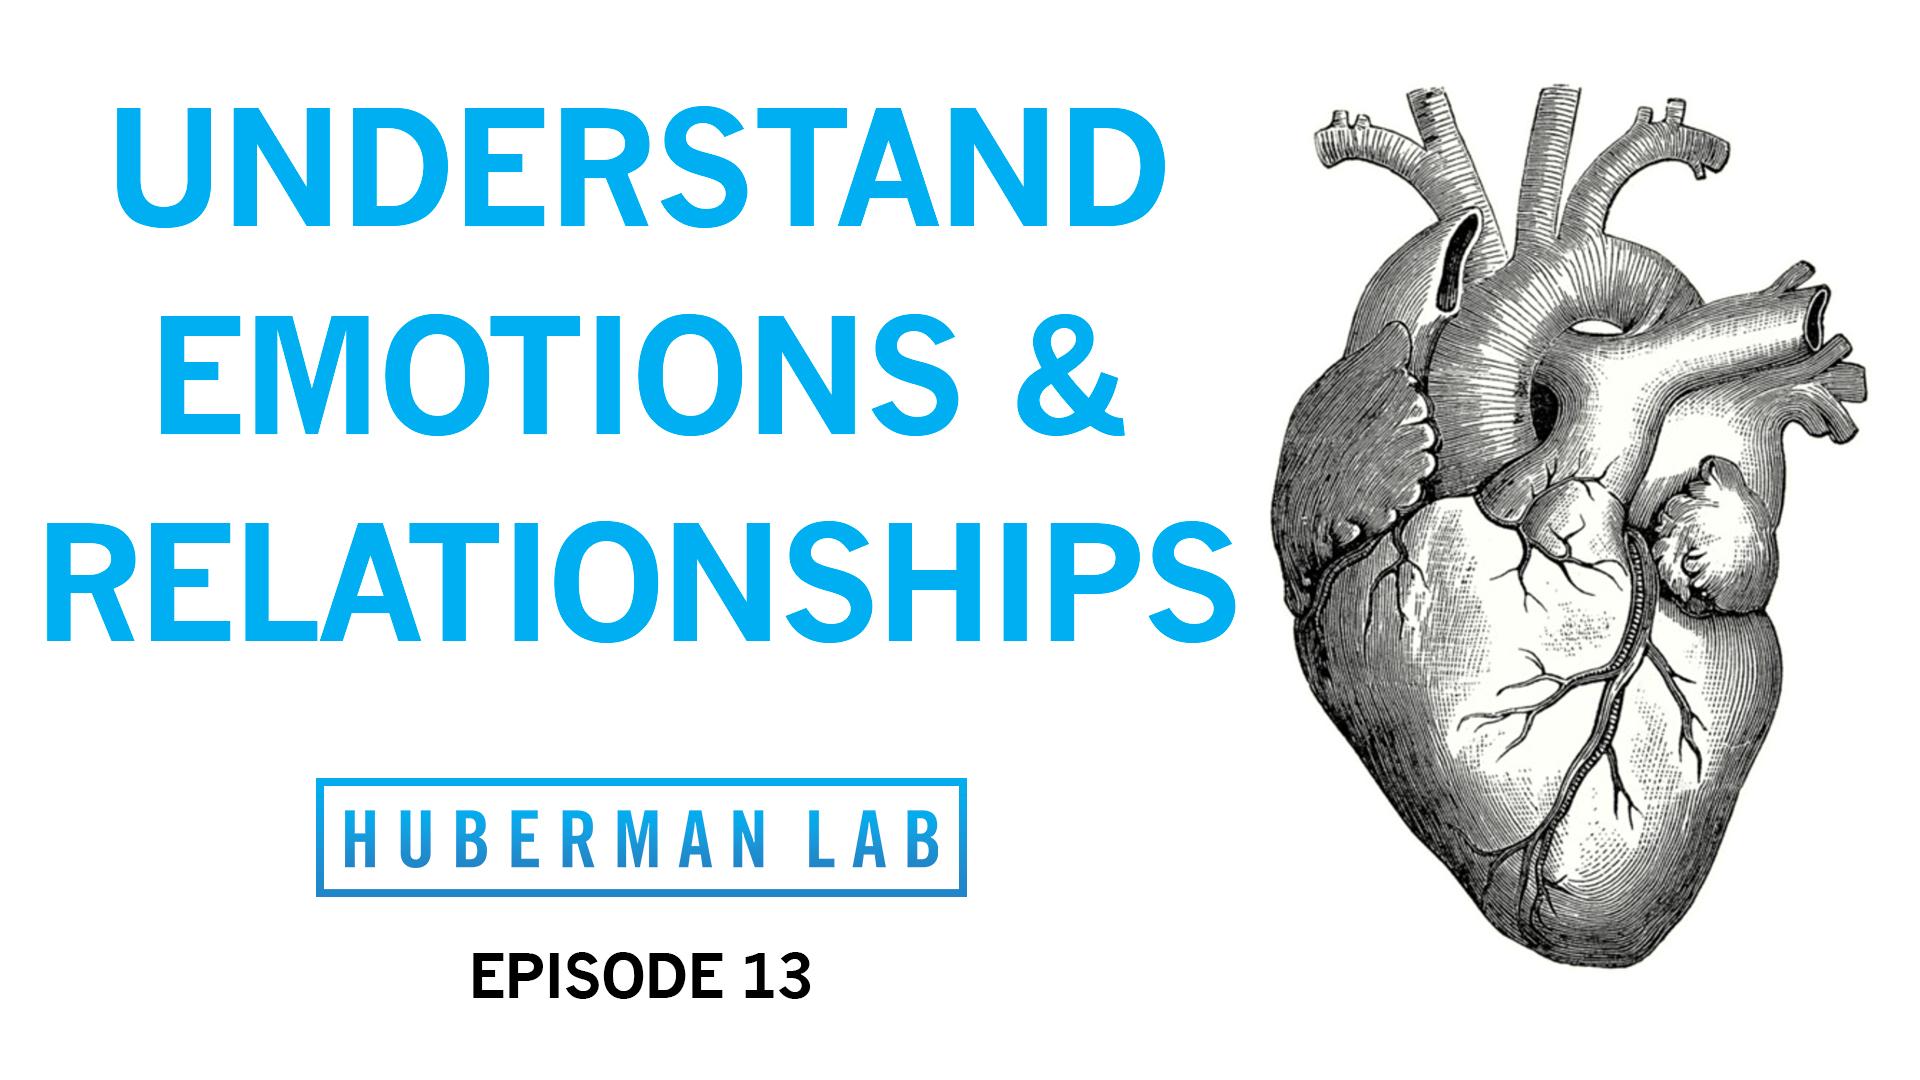 Huberman Lab Podcast Episode 13 Title Card